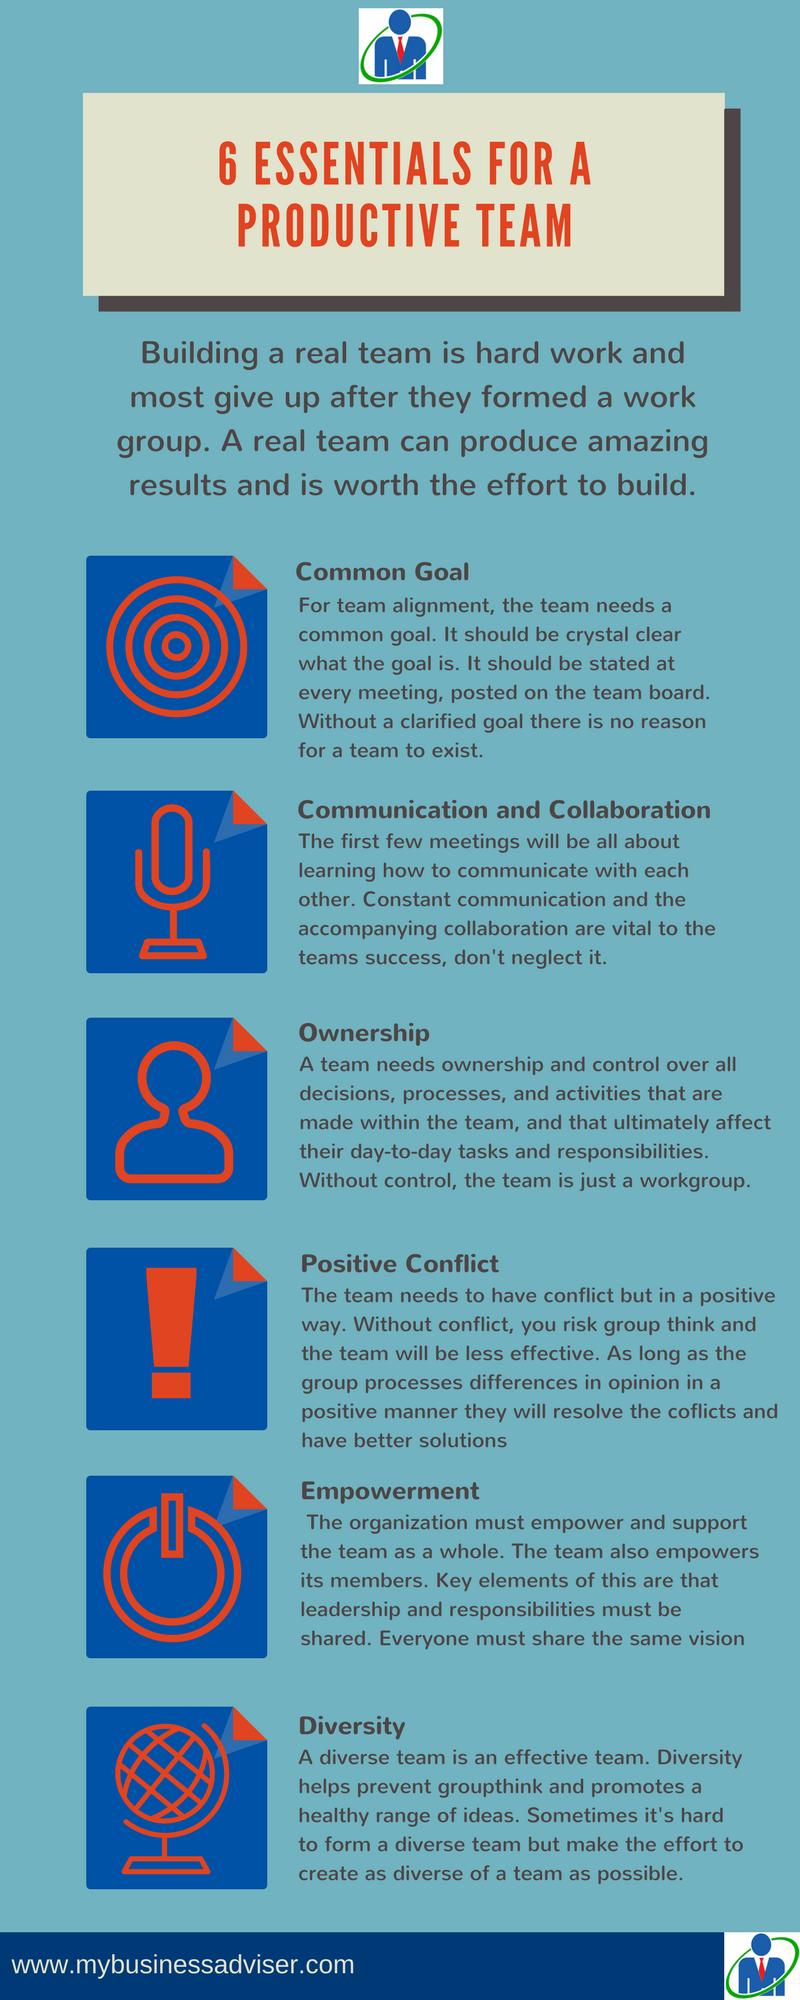 6 Essentials for a productive team